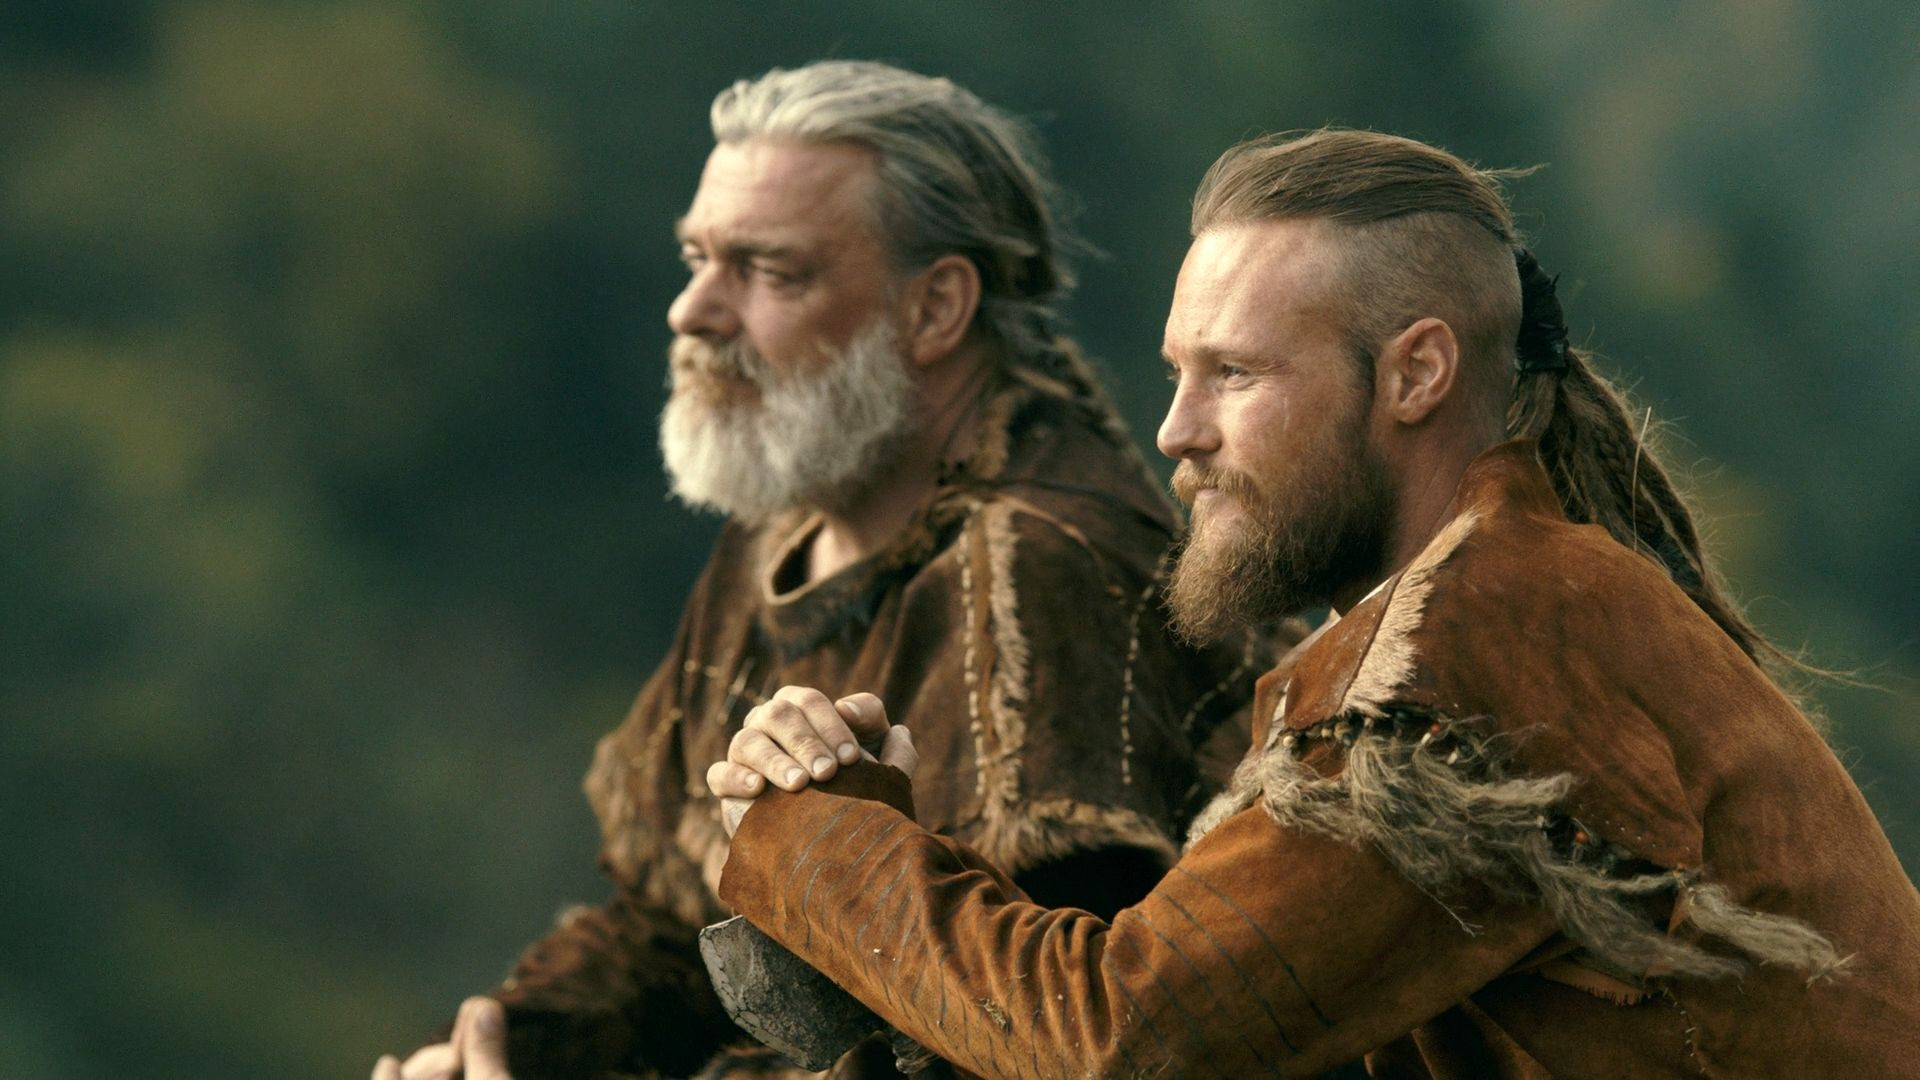 Vikings — s06e20 — The Last Act